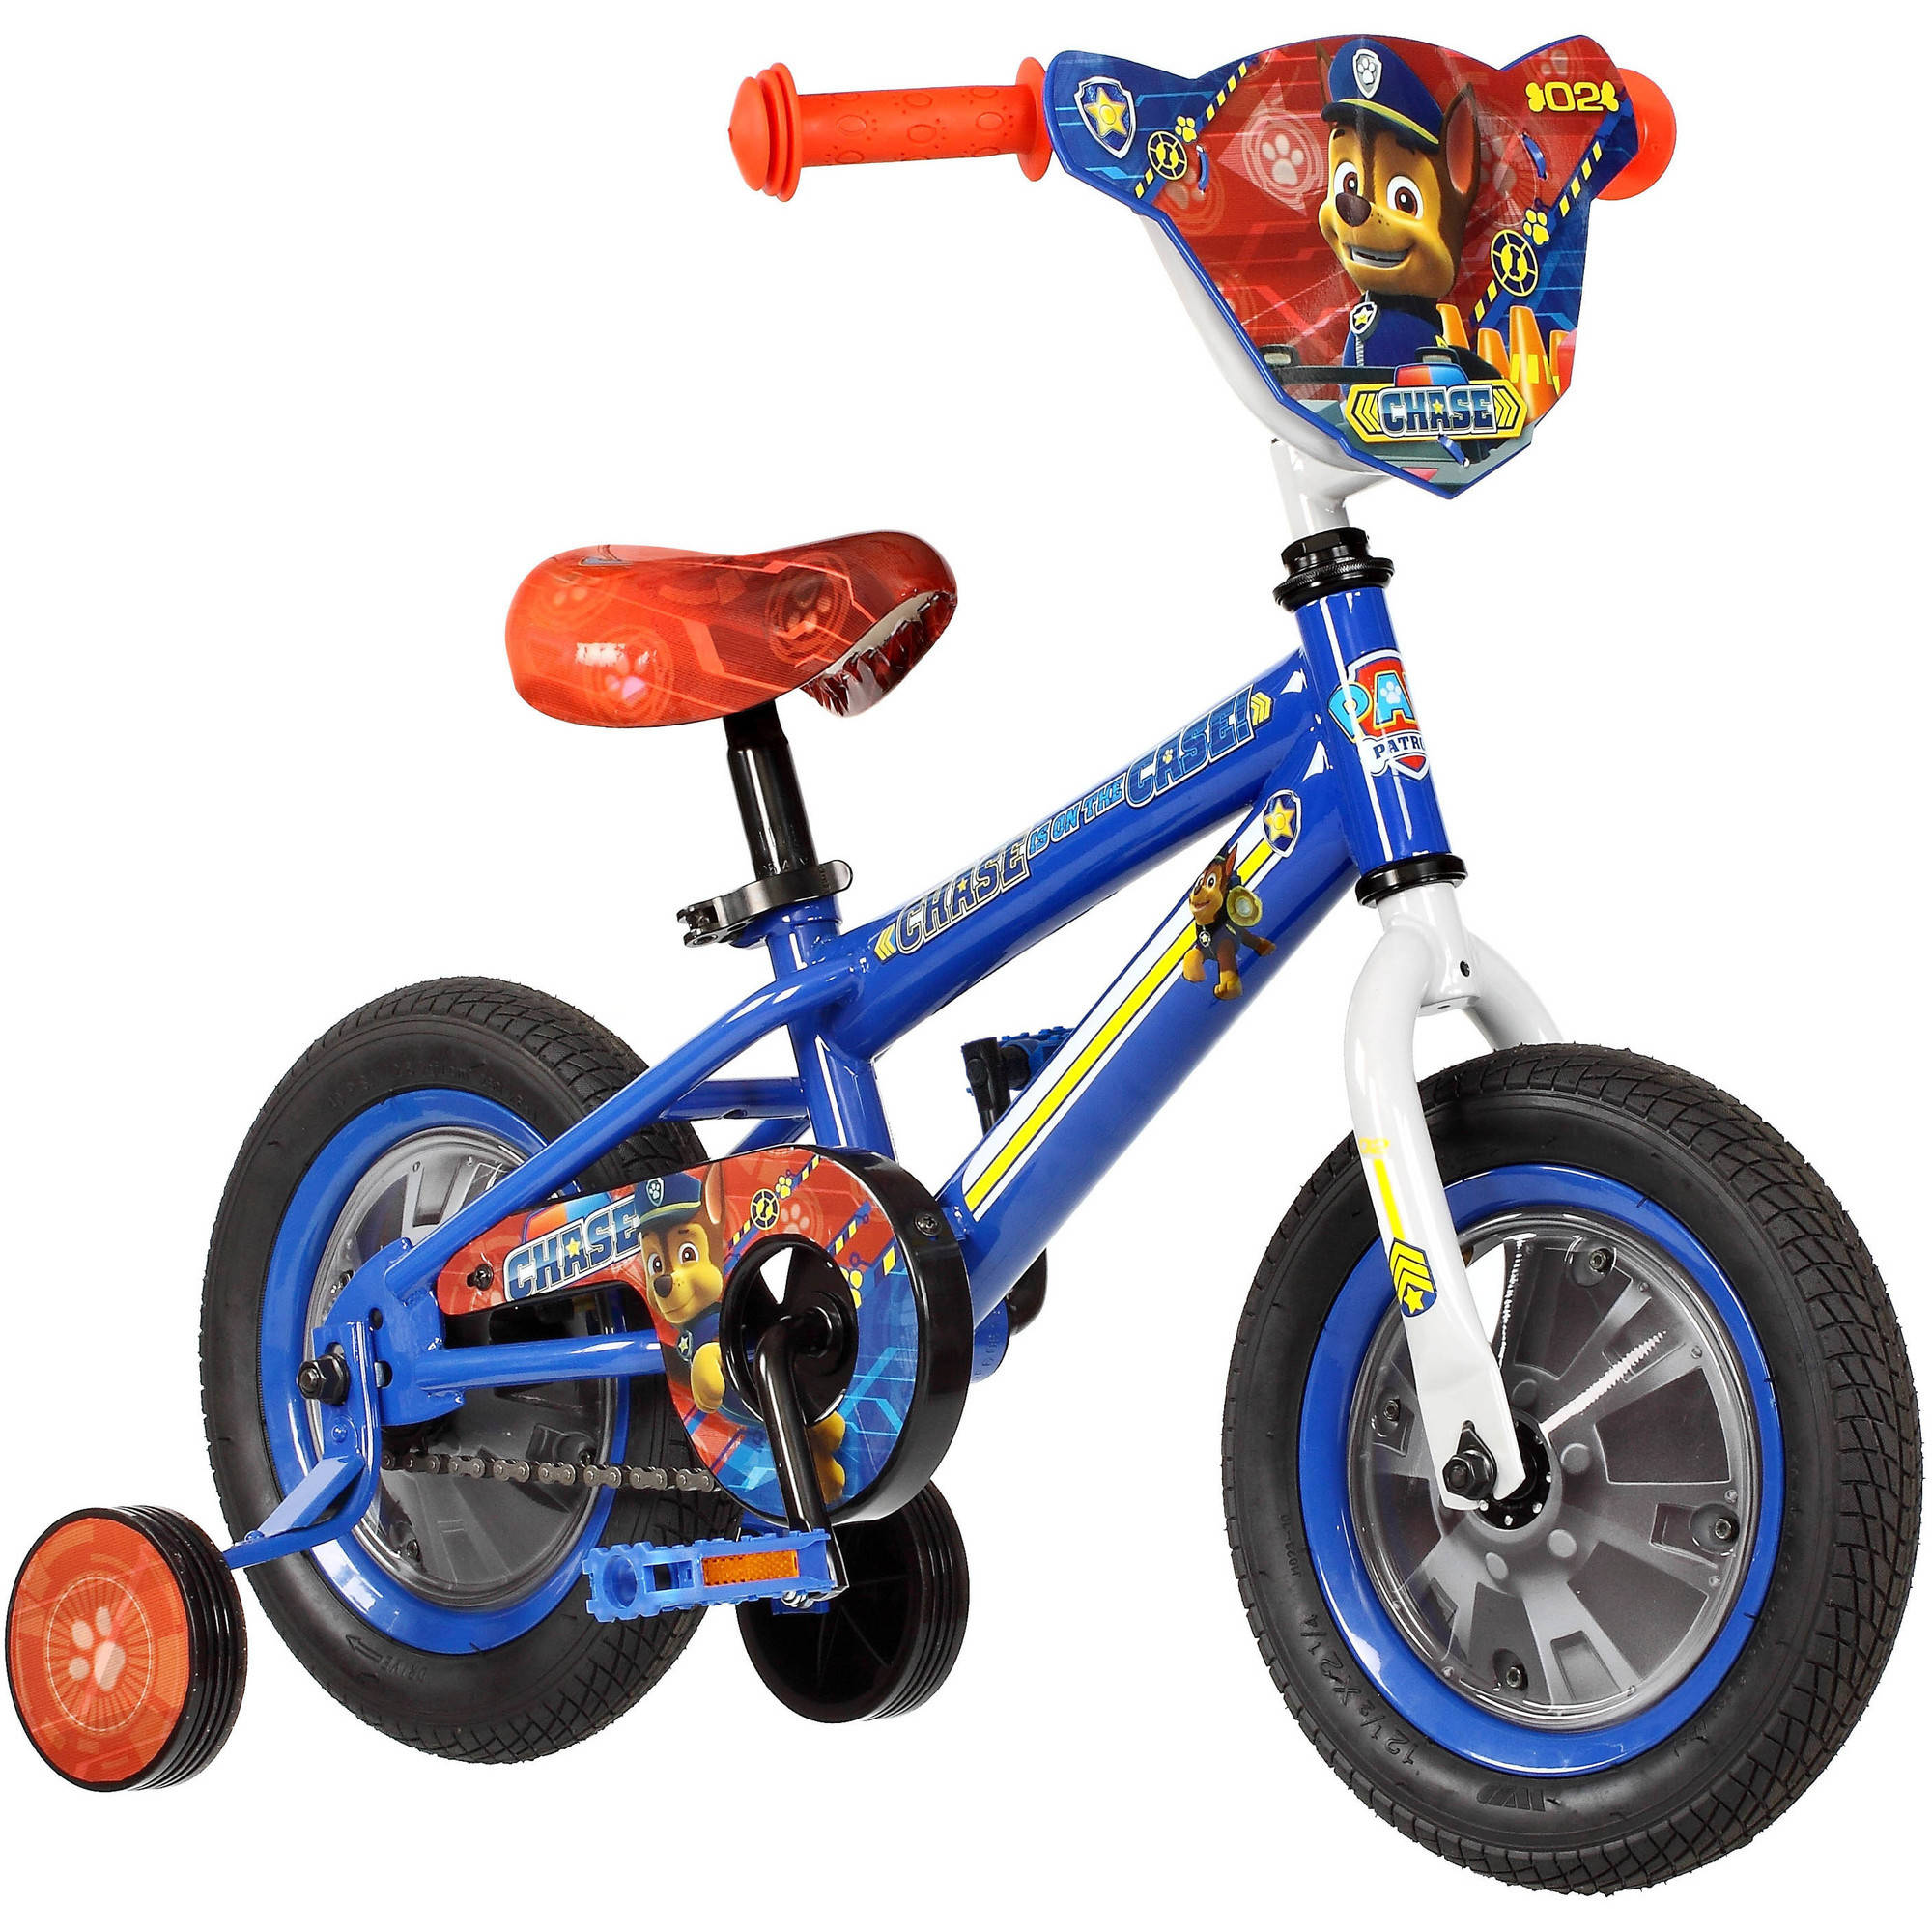 "12"" Paw Patrol Bike Featuring Chase"